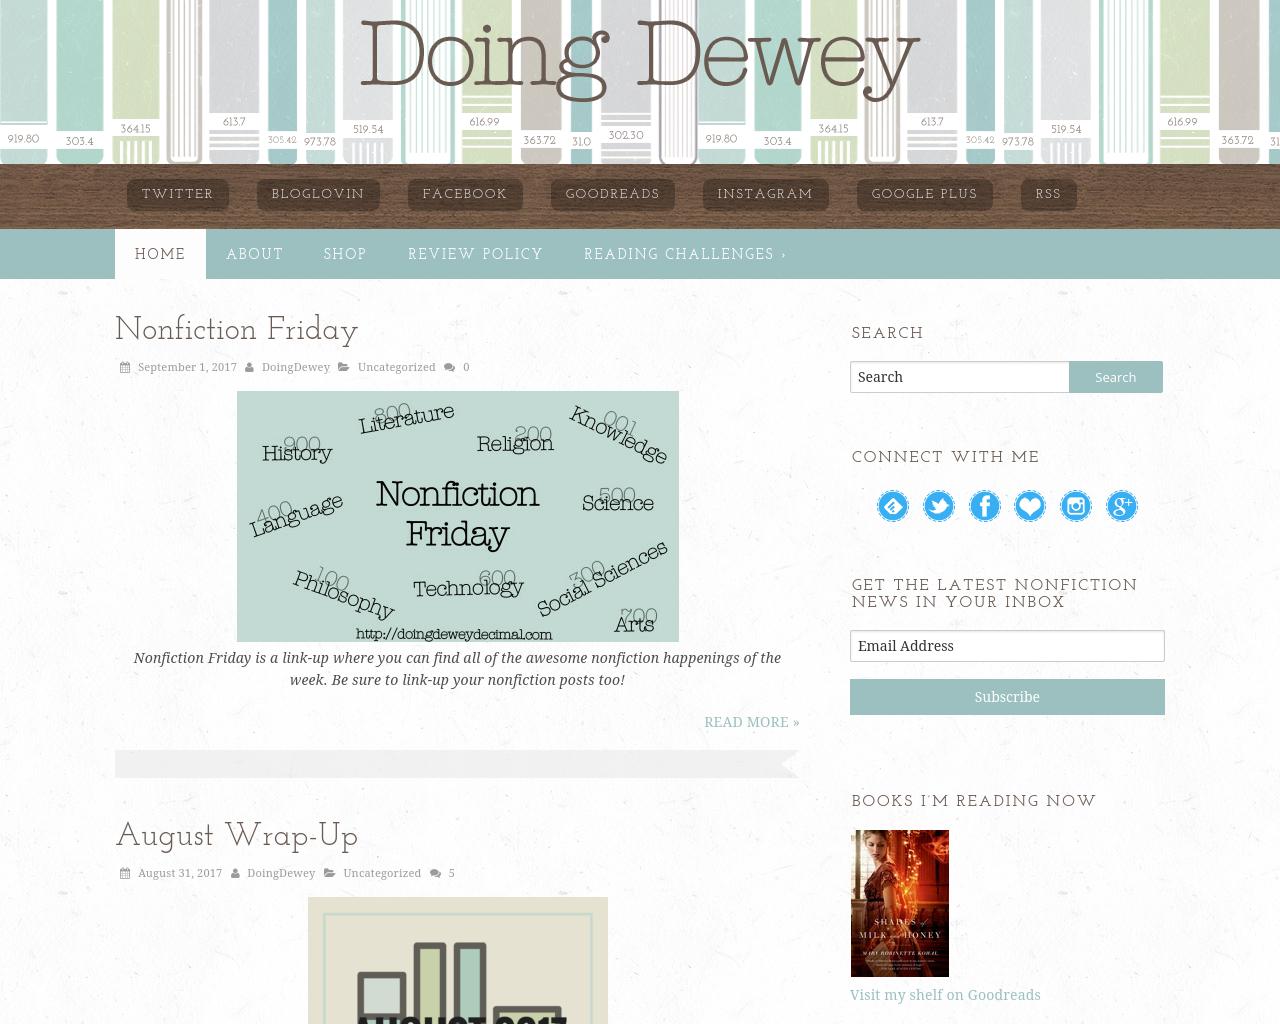 Doing-Dewey-Decimal-Advertising-Reviews-Pricing